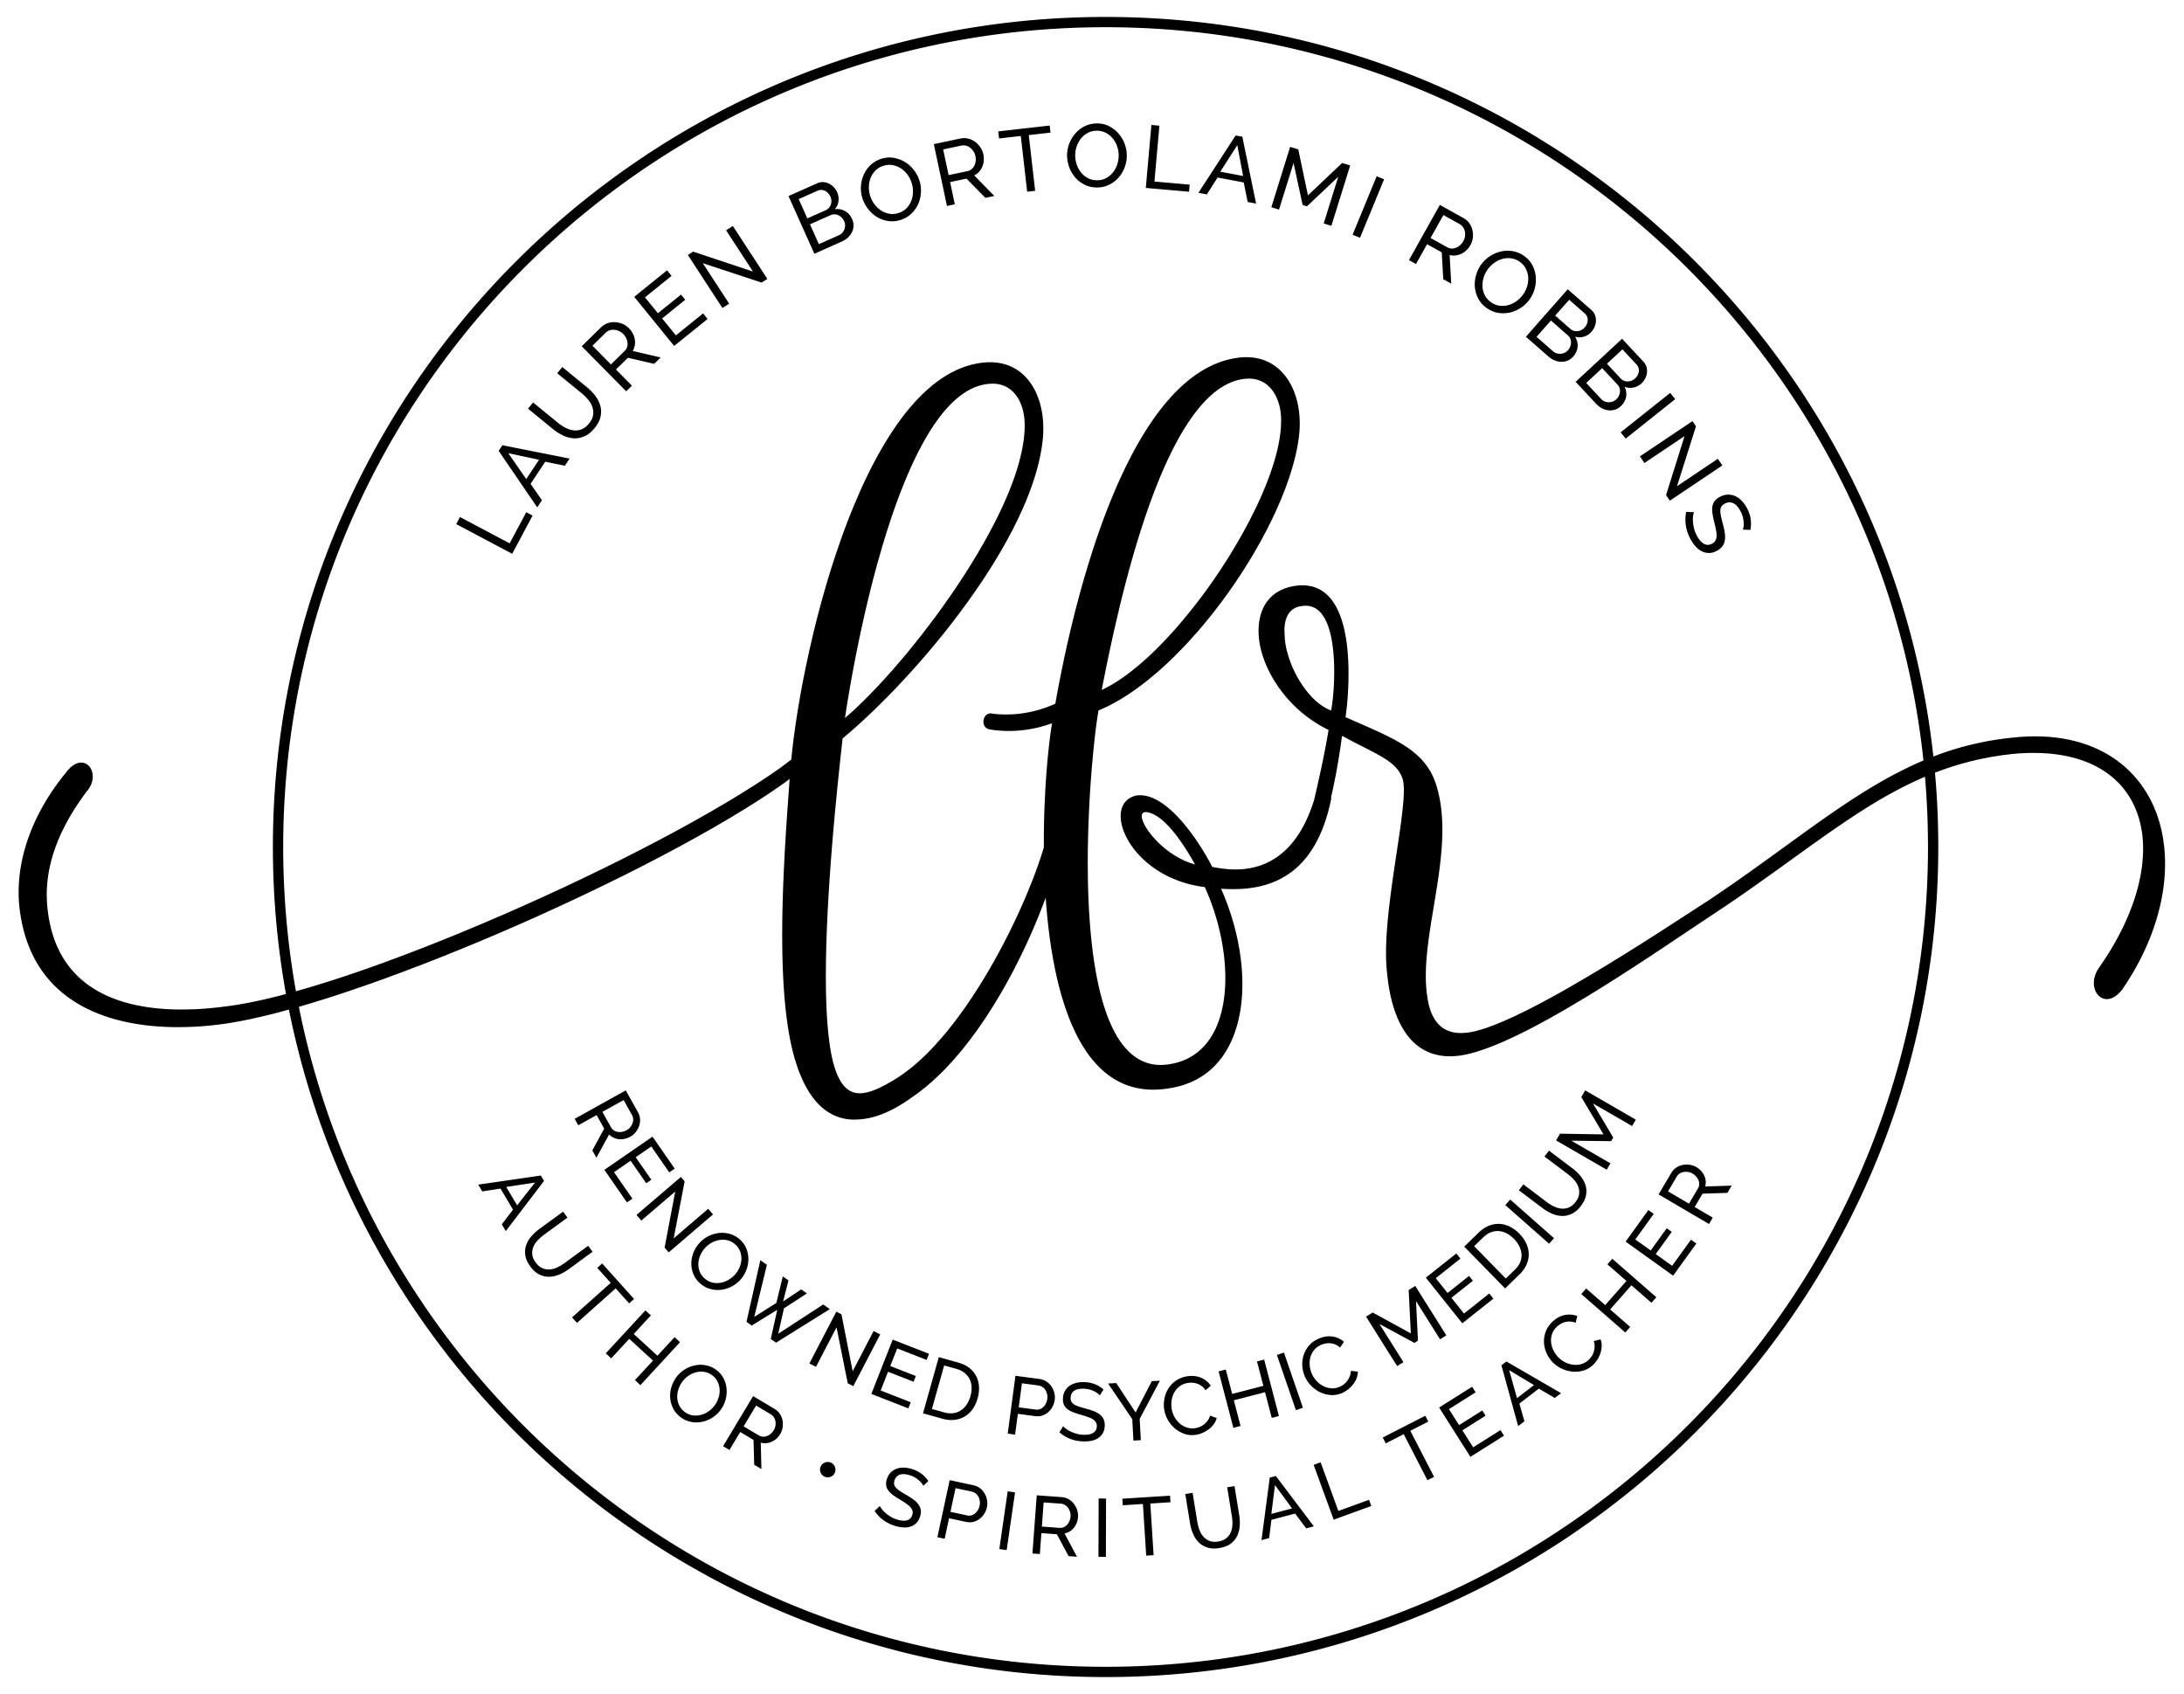 The Spiritual Path with Lauren Bortolami Robbins